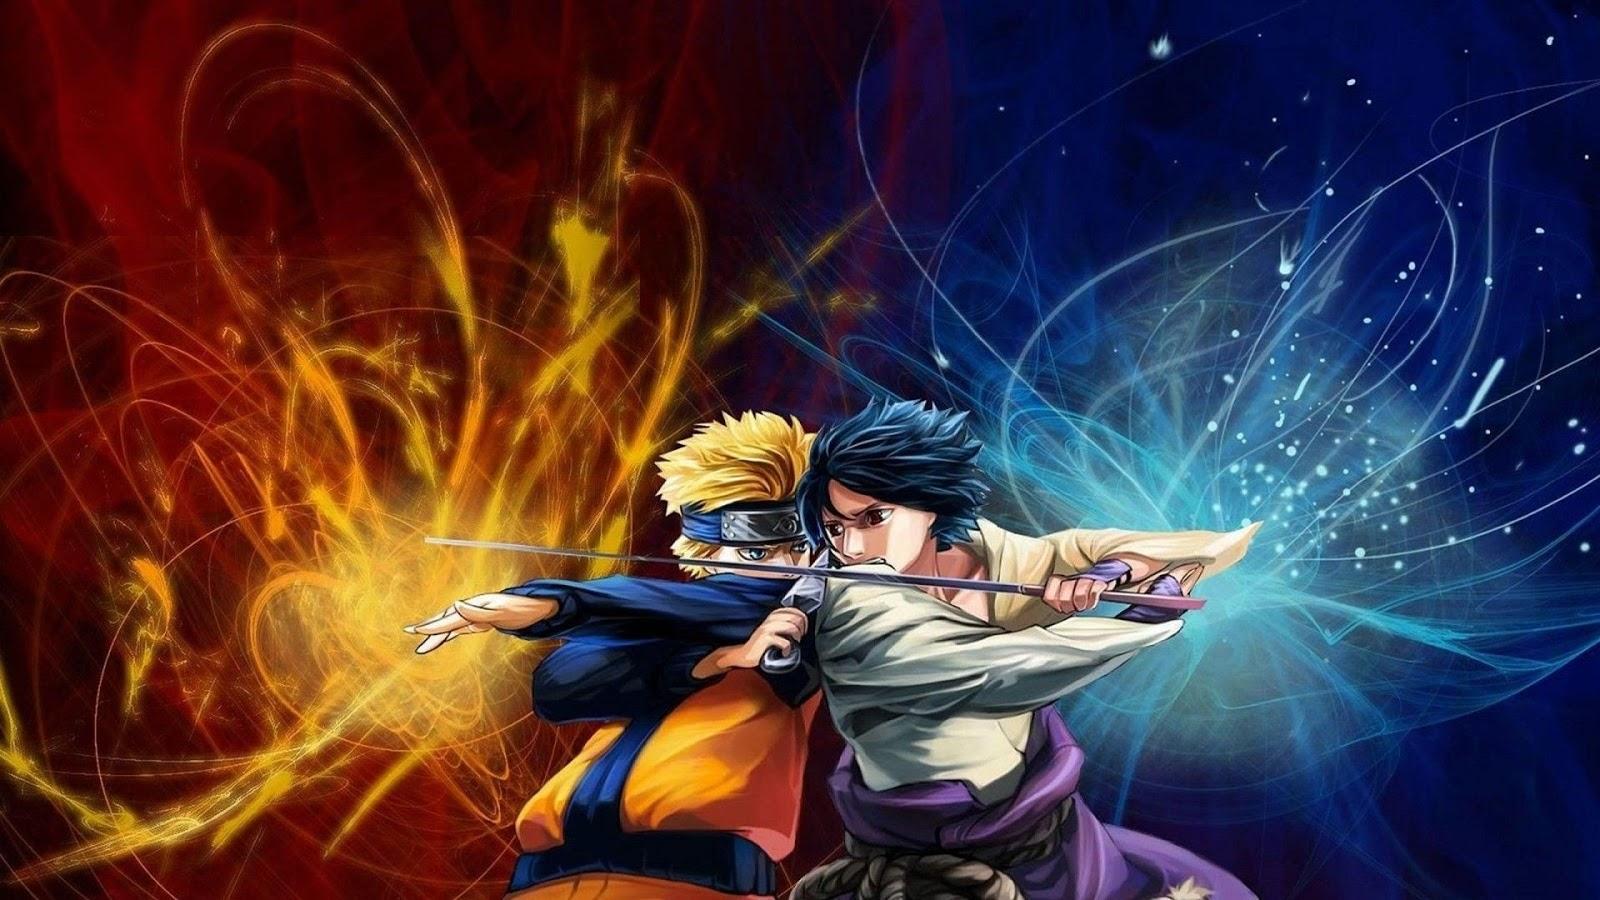 Good Wallpaper Naruto Supreme - akatsuki%2Bsasuke%2Bwallpaper%2Biphone%2B7%2Bimages%2Bof%2Bnaruto%2Bcharacters%2Bnaruto%2Biphone%2B6%2Bwallpaper%2Bnaruto%2Bwallpaper%2Biphone  Pic.jpg